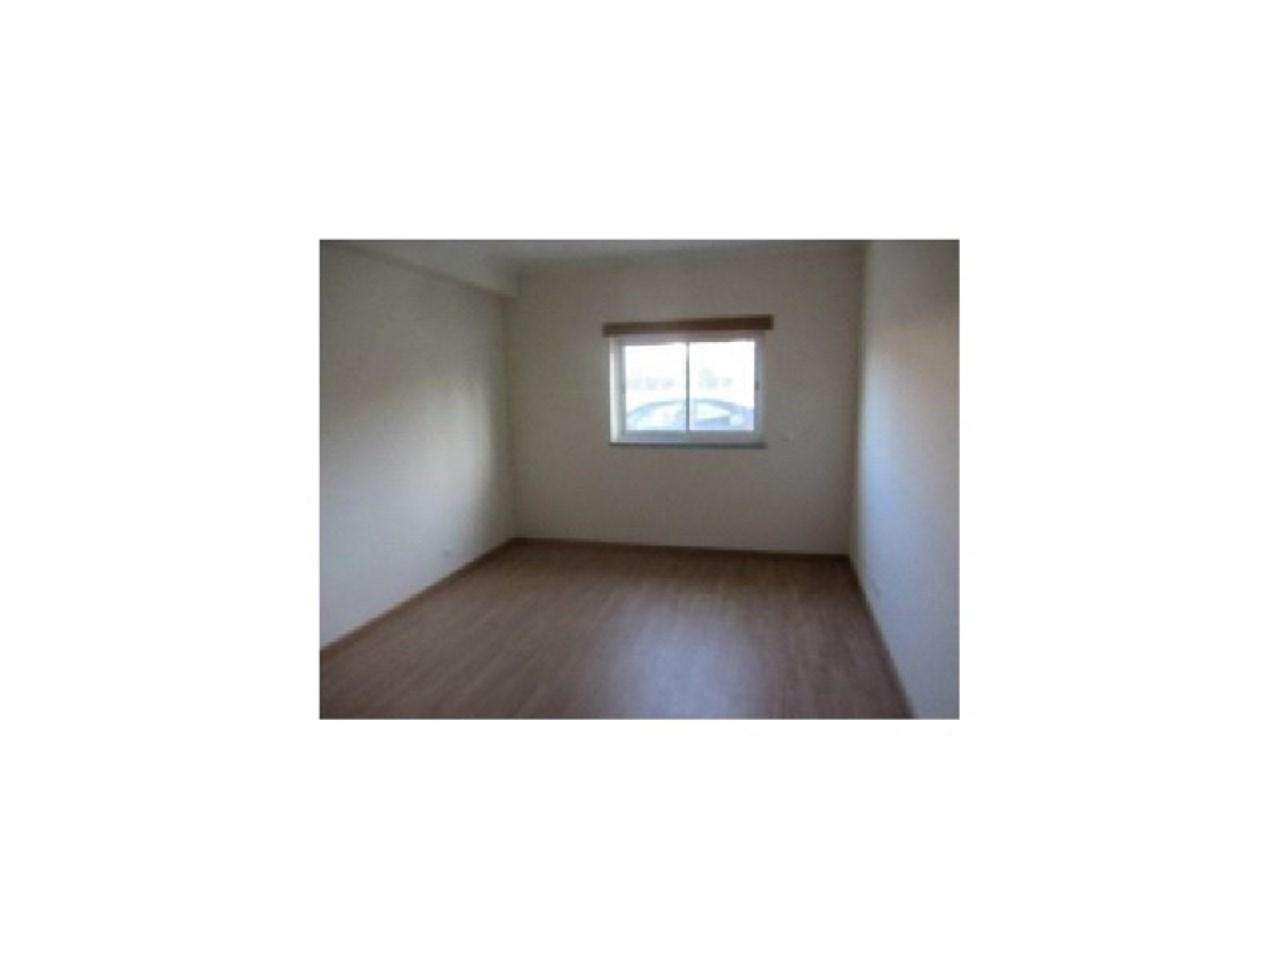 Apartamento para comprar, Caria, Belmonte, Castelo Branco - Foto 3